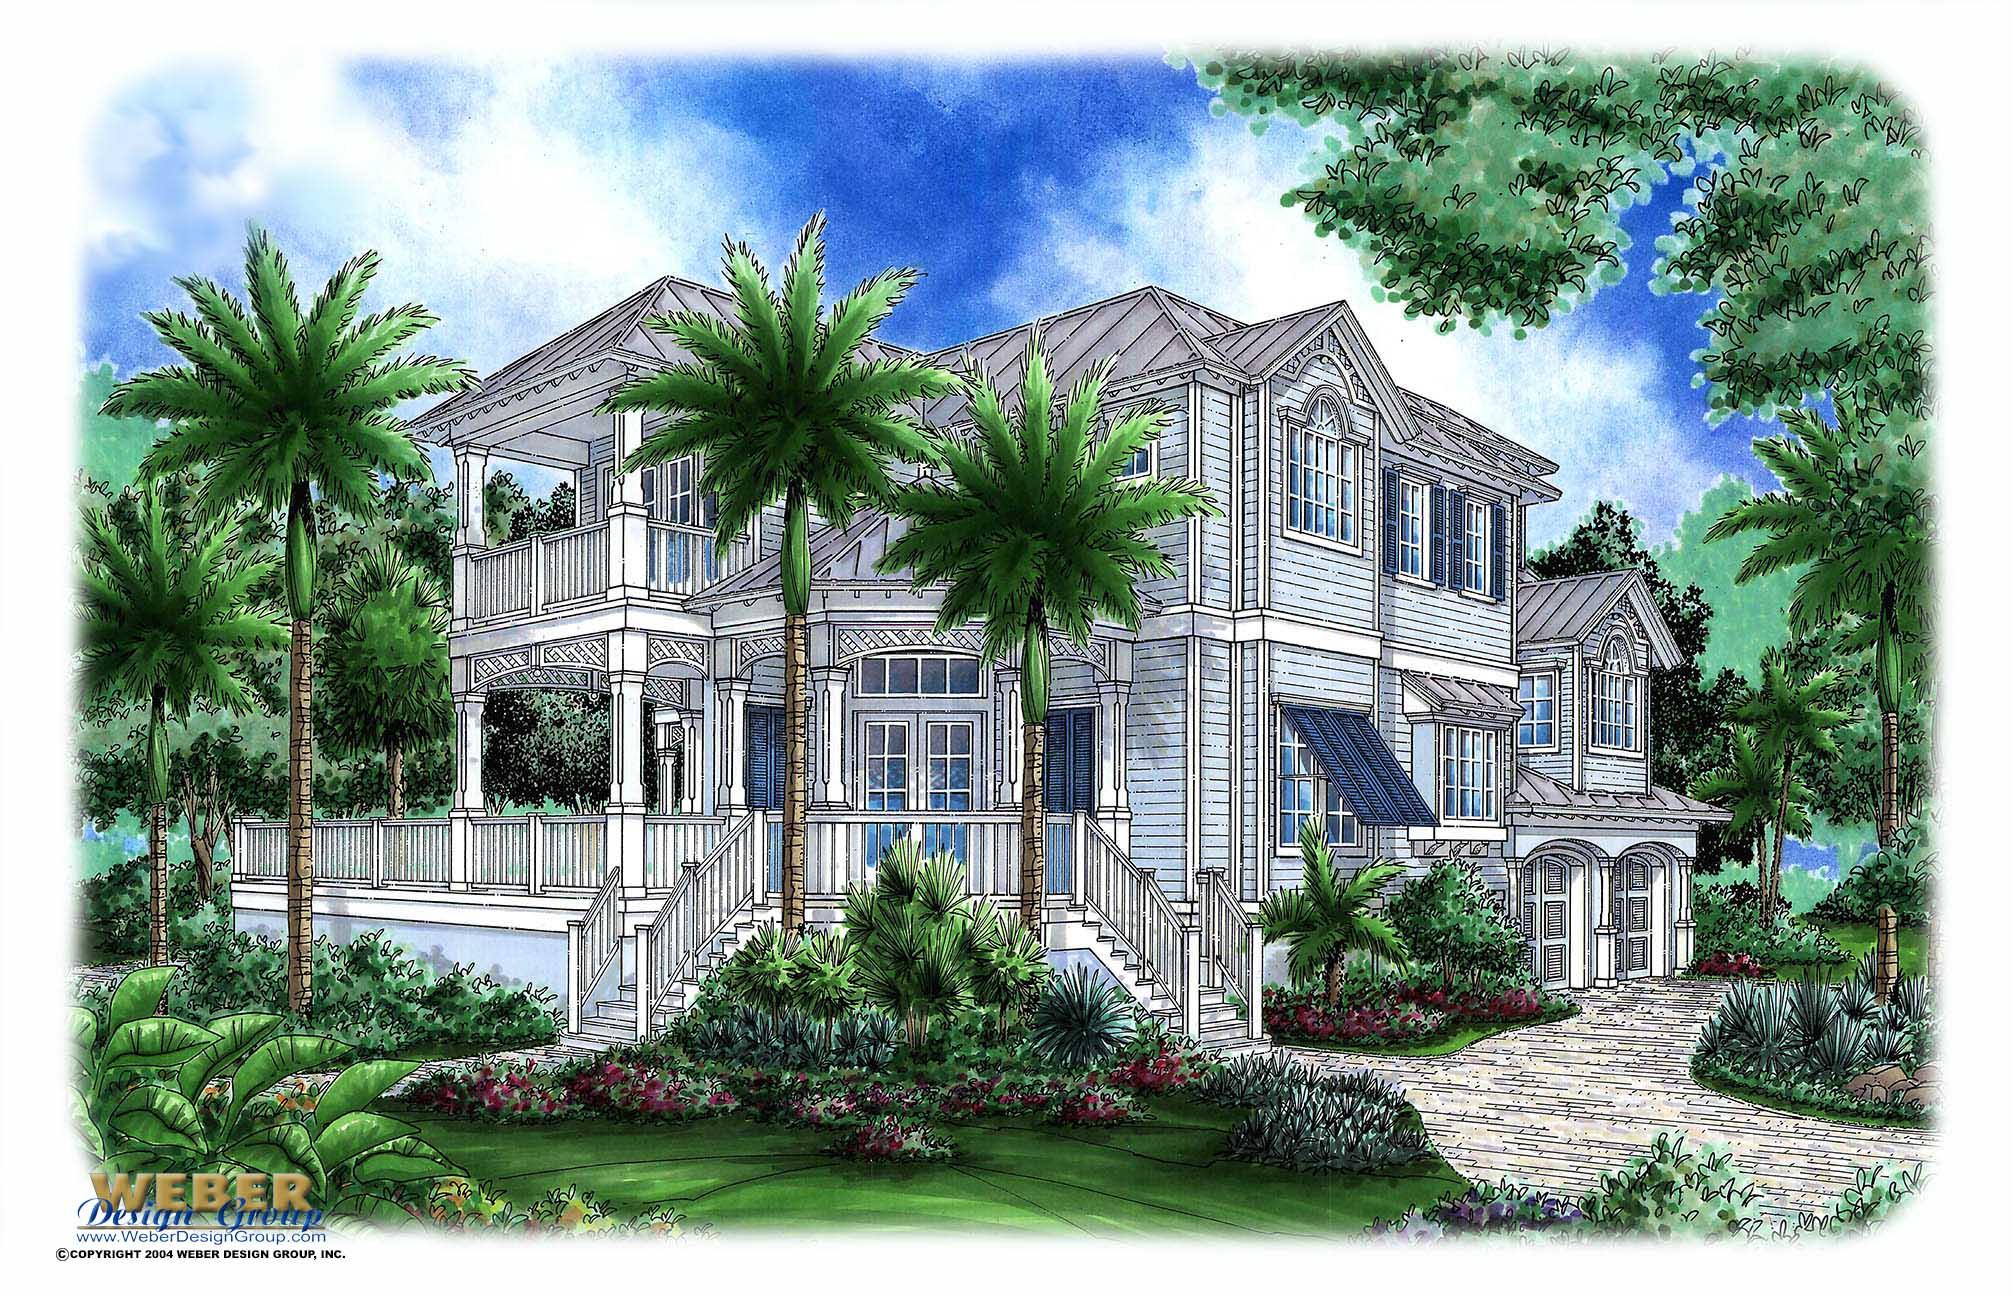 siesta key house plan